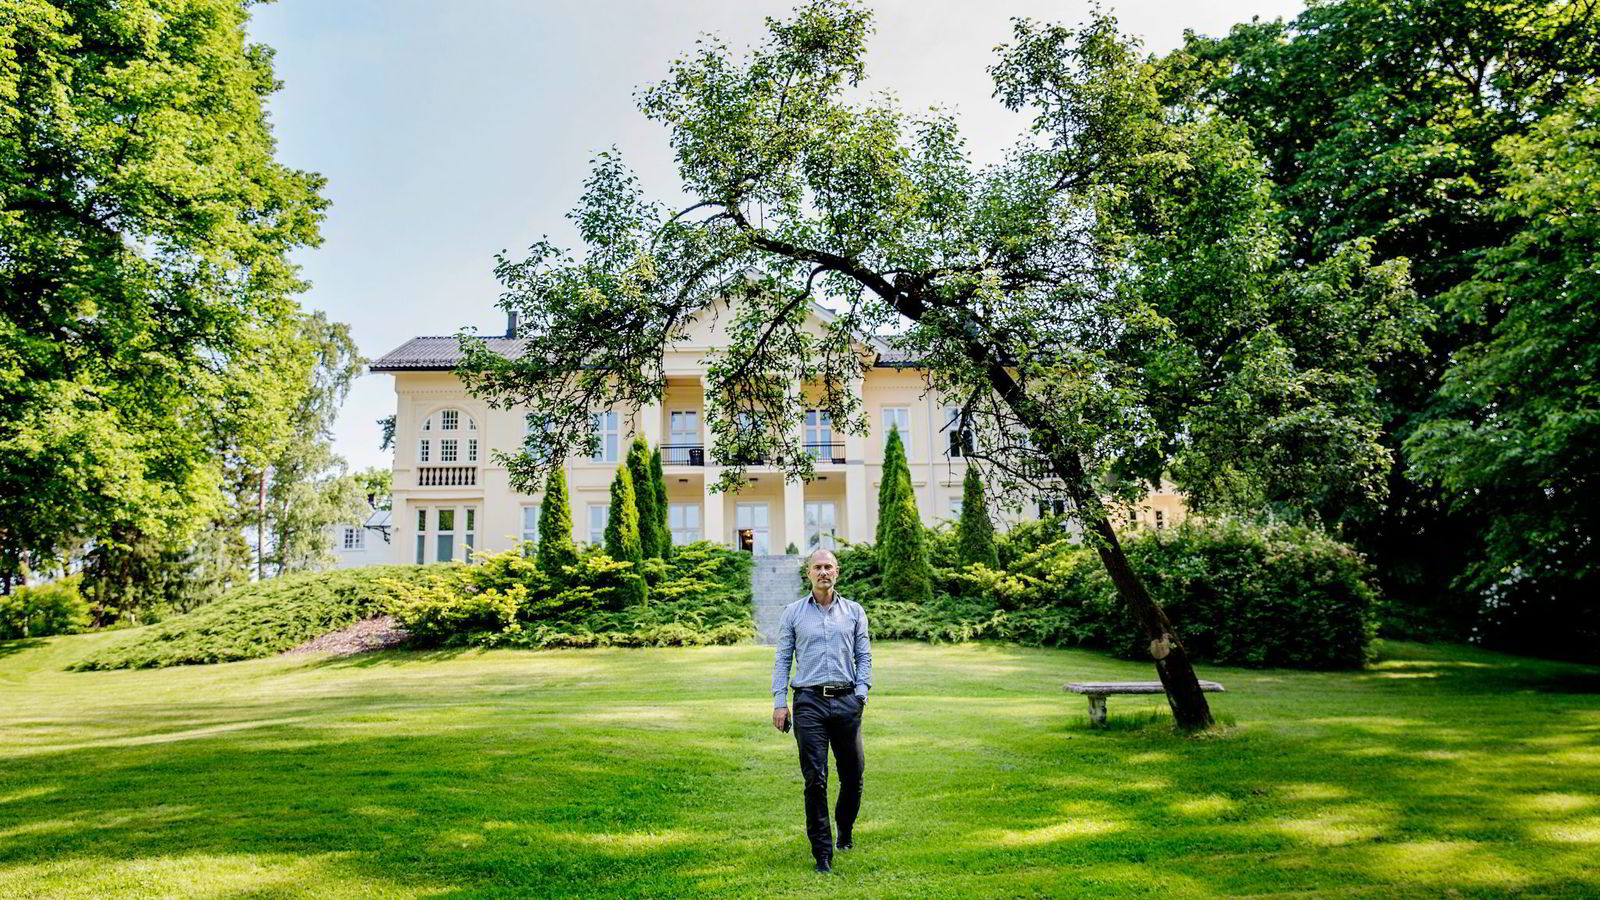 På Madserud Gård like ved Frognerparken skal Andreas Wabøs nye selskap Agera hjelpe frem nye norske gründerbedrifter. Foto: Fredrik Bjerknes